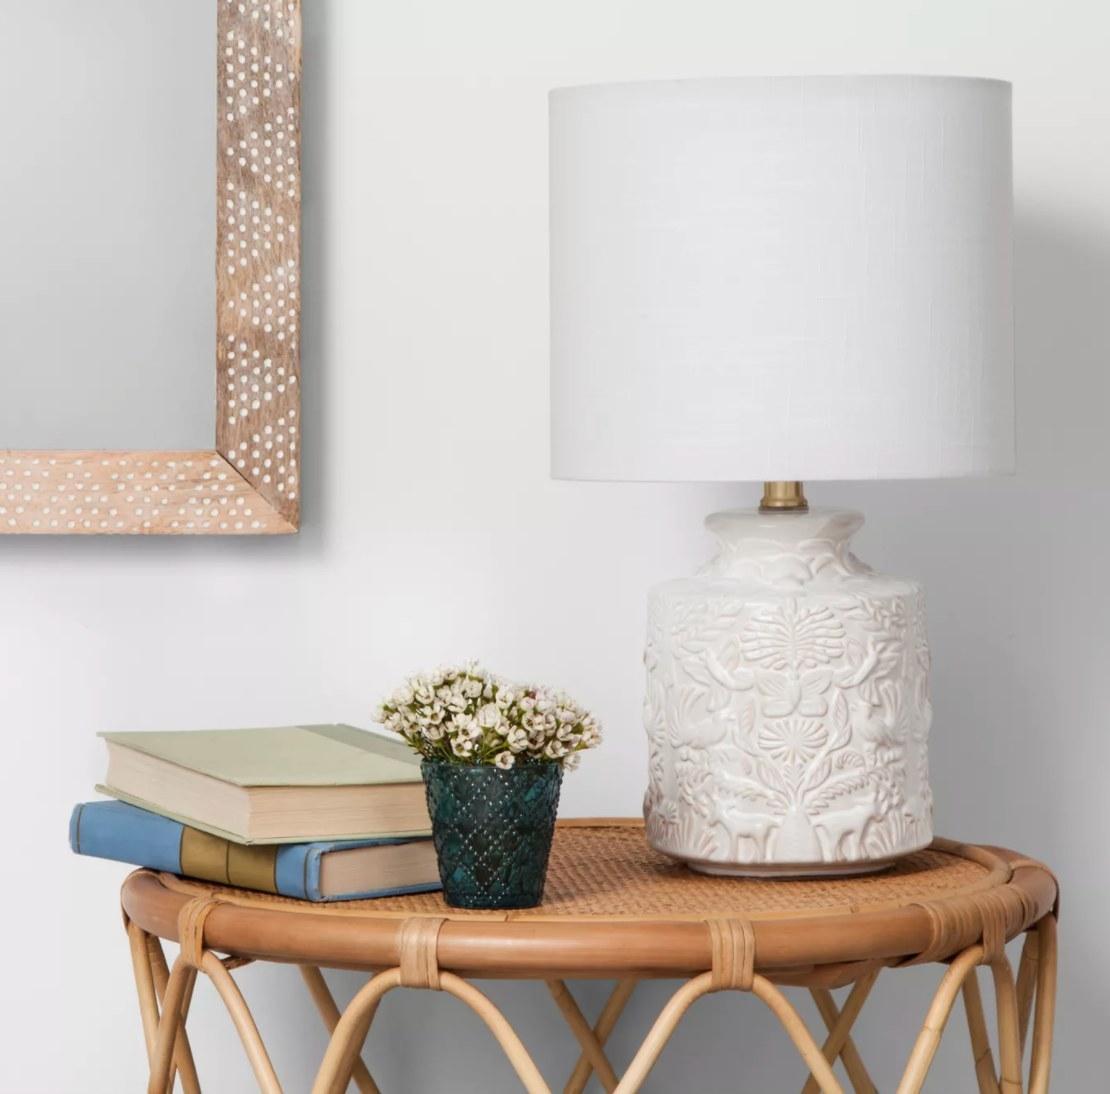 The white ceramic table lamp